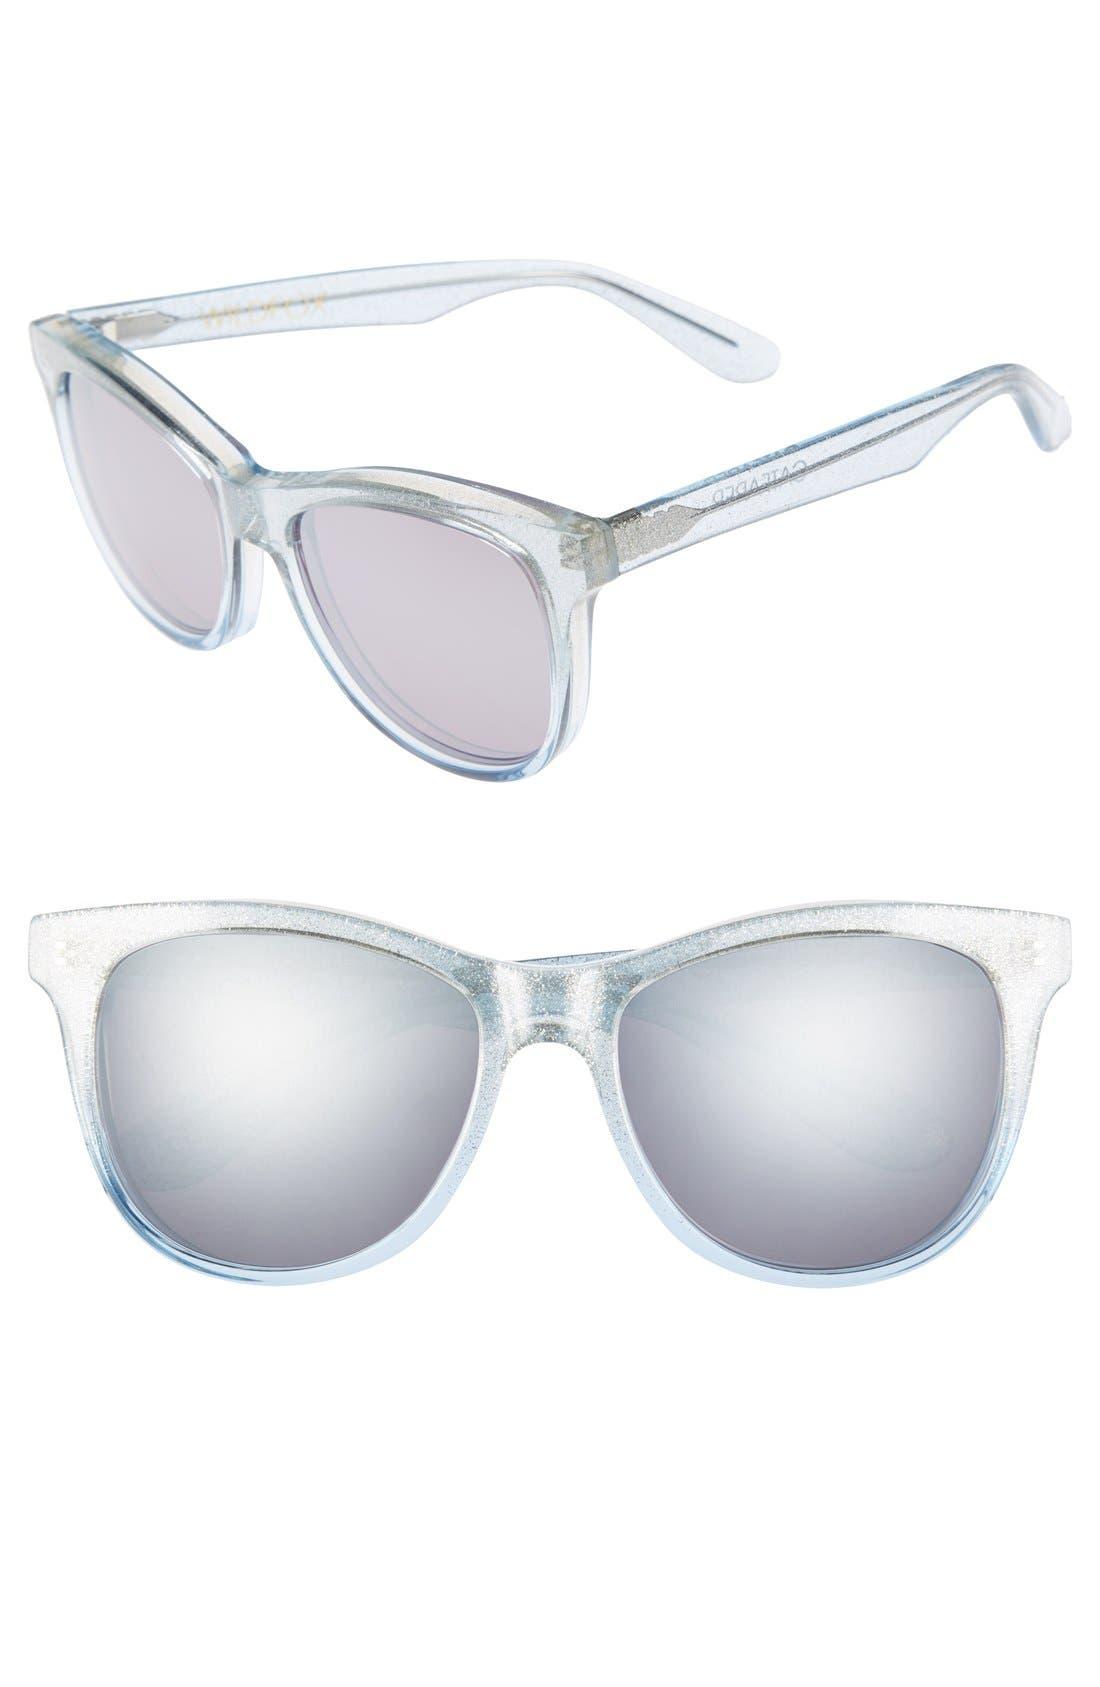 Main Image - Wildfox 'Catfarer Deluxe' 53mm Sunglasses